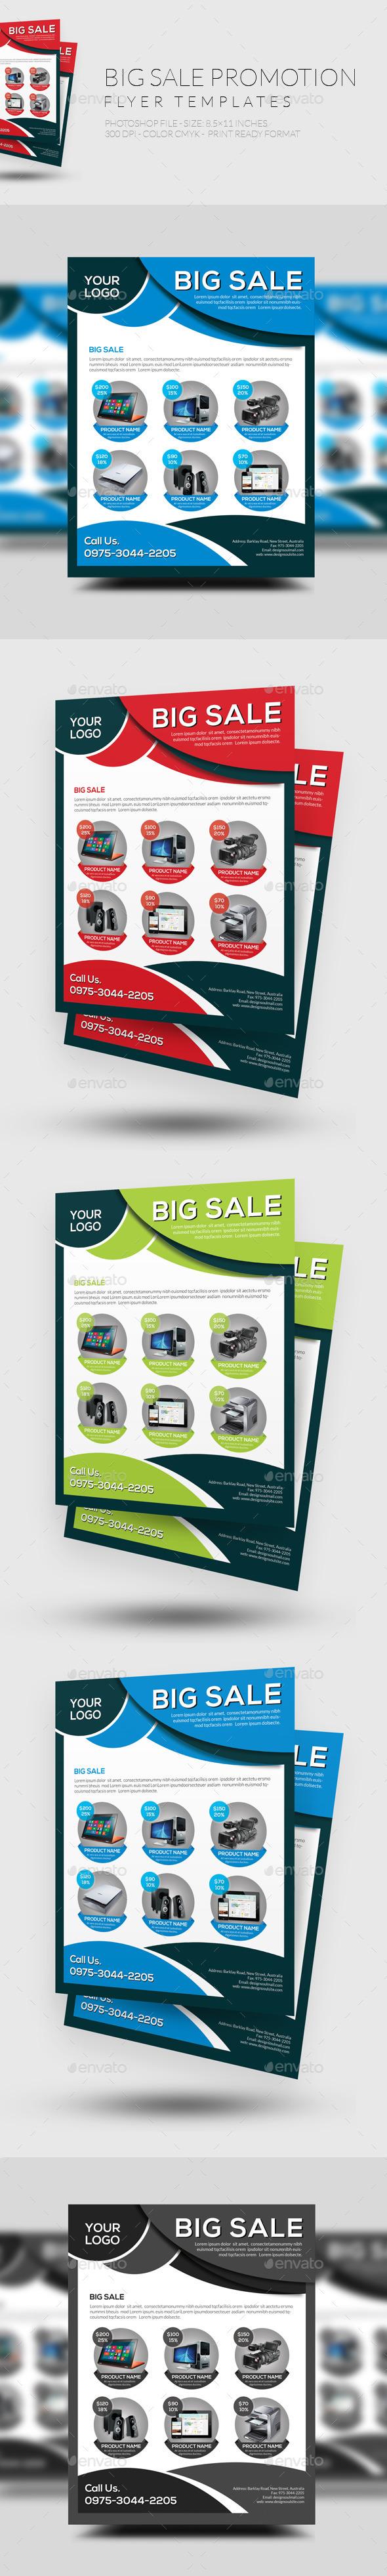 Big Sale Promotion Flyer - Commerce Flyers